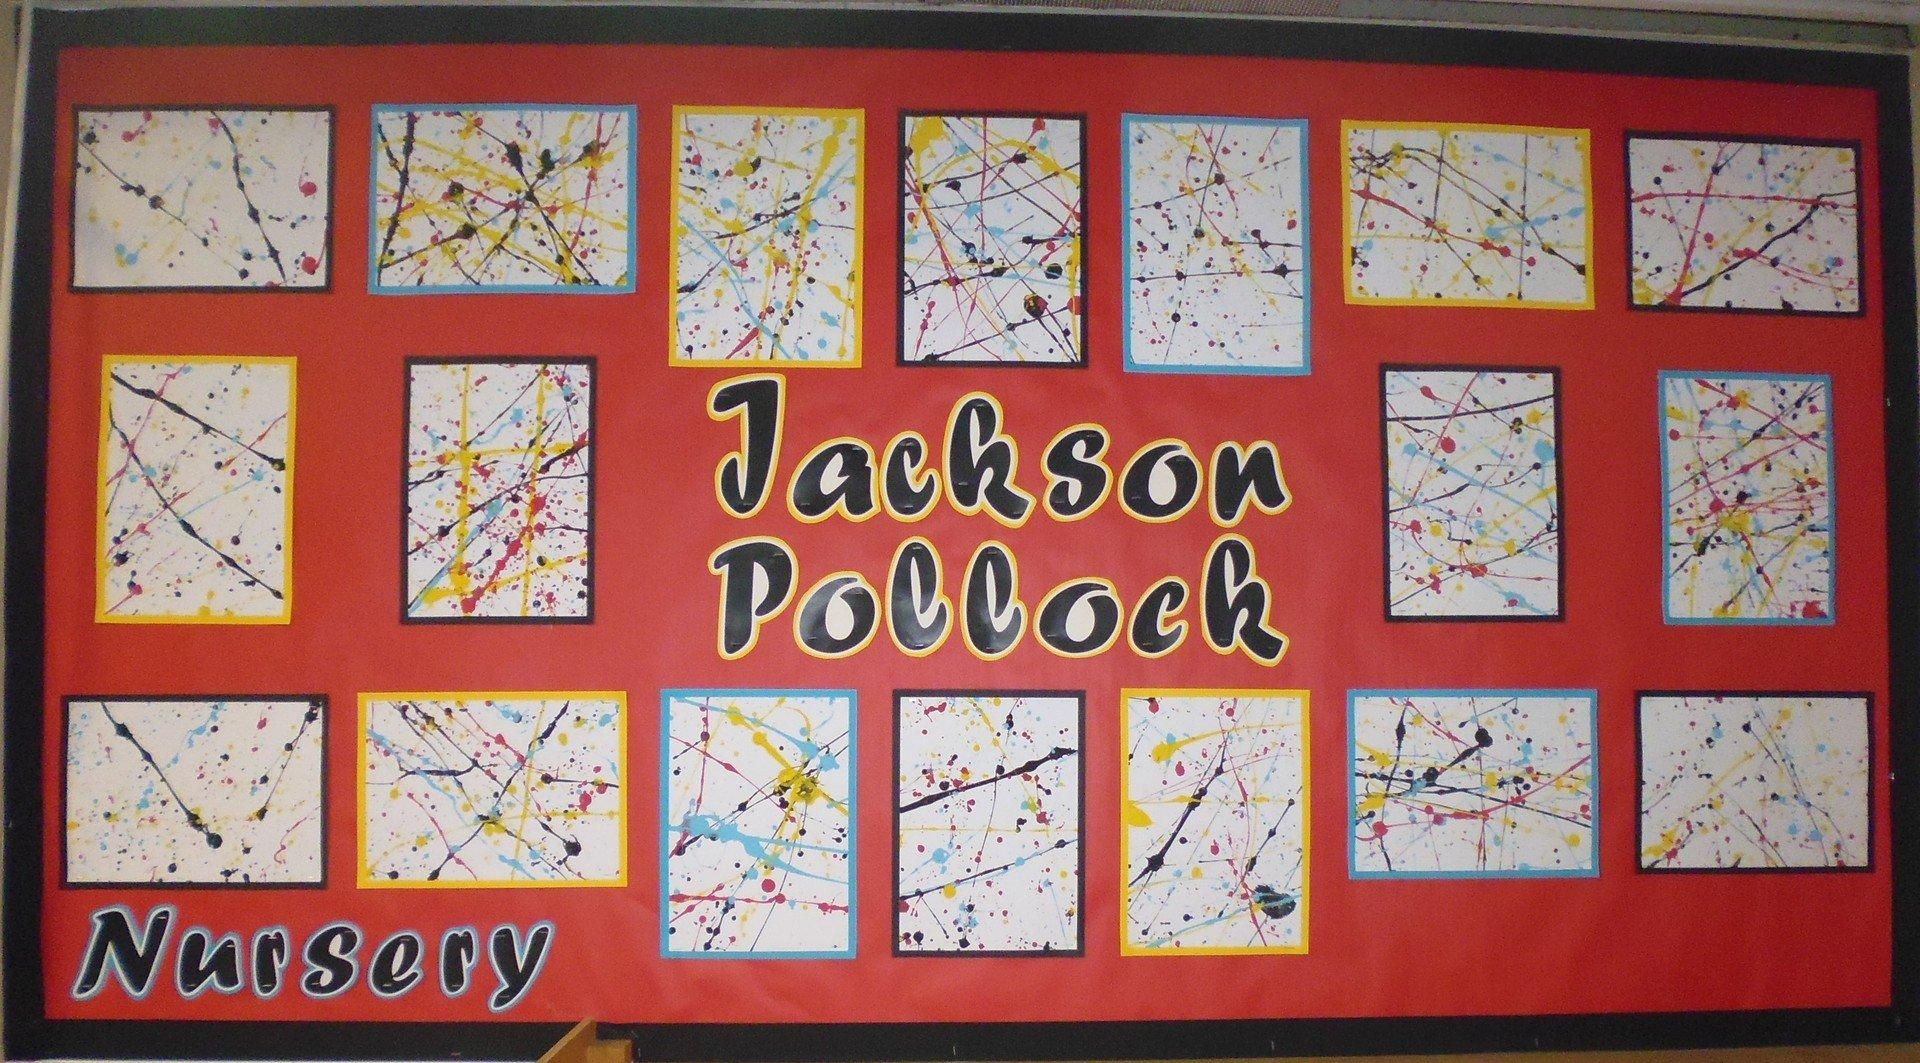 Nursery Artwork of Pollock